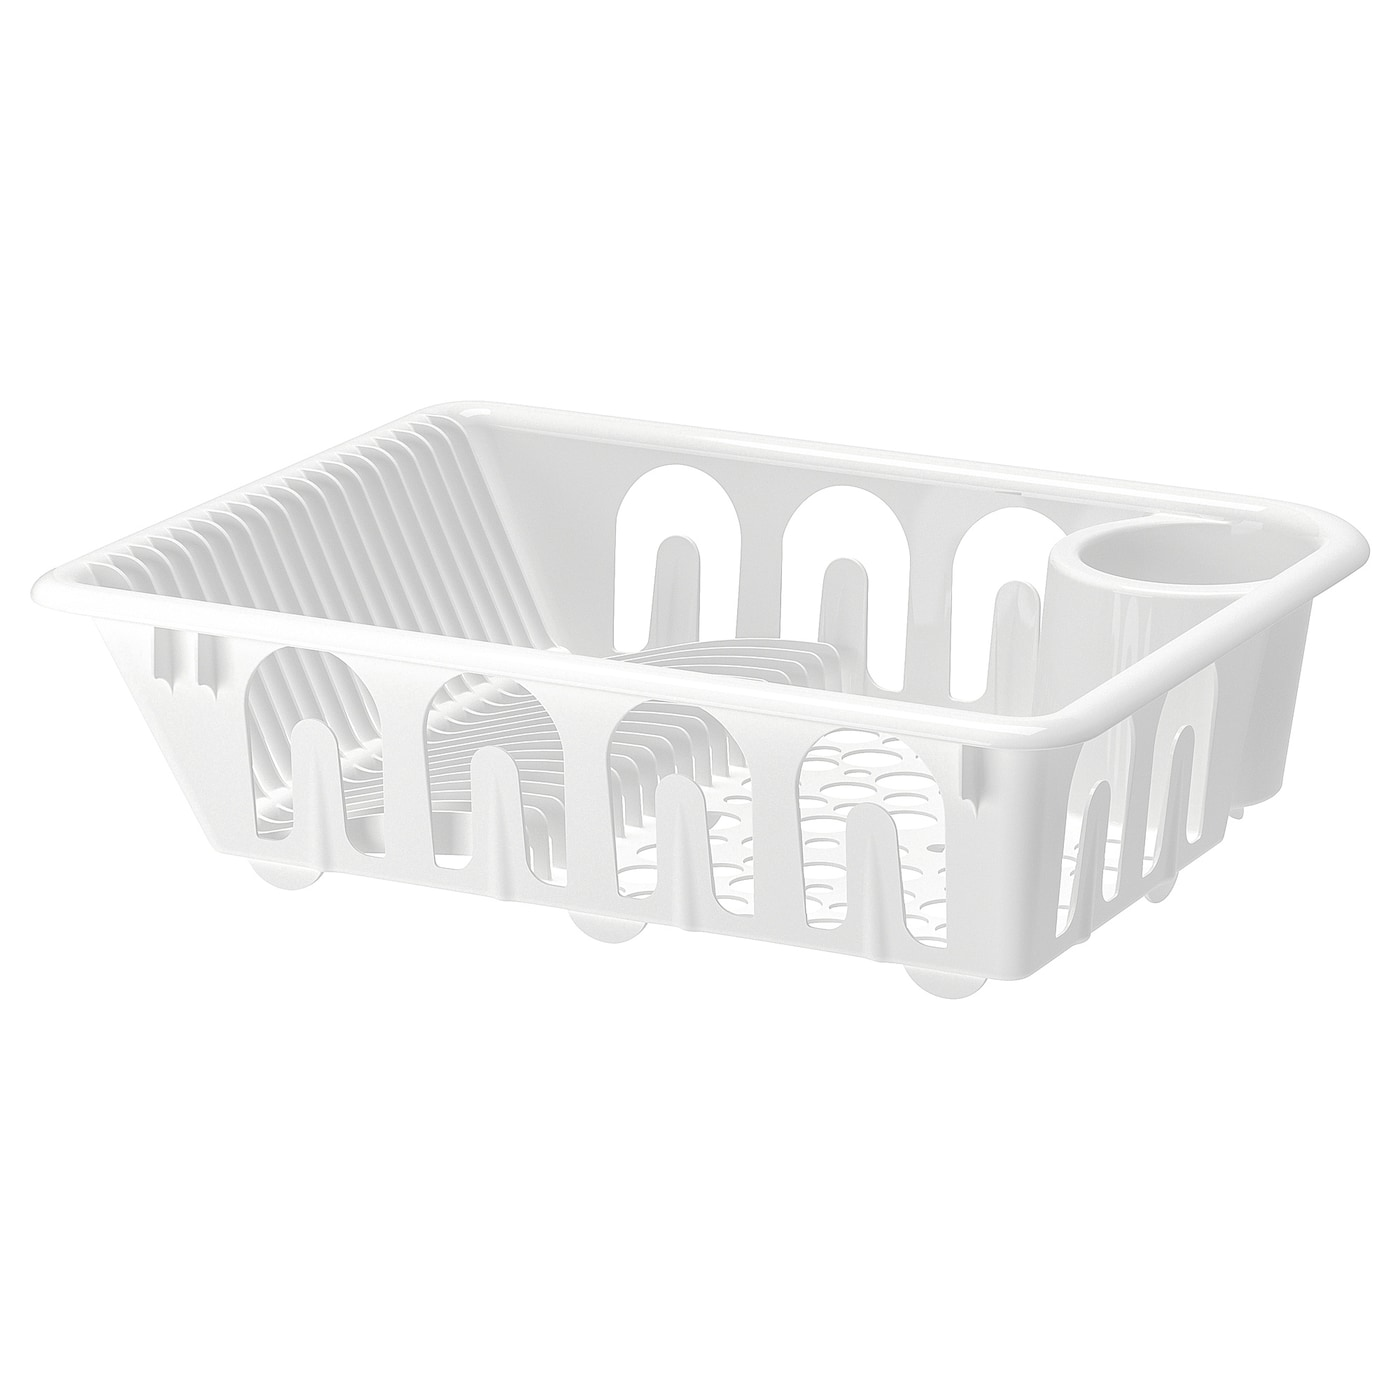 IKEA FLUNDRA escurreplatos También caben platos grandes b5b60882d20d